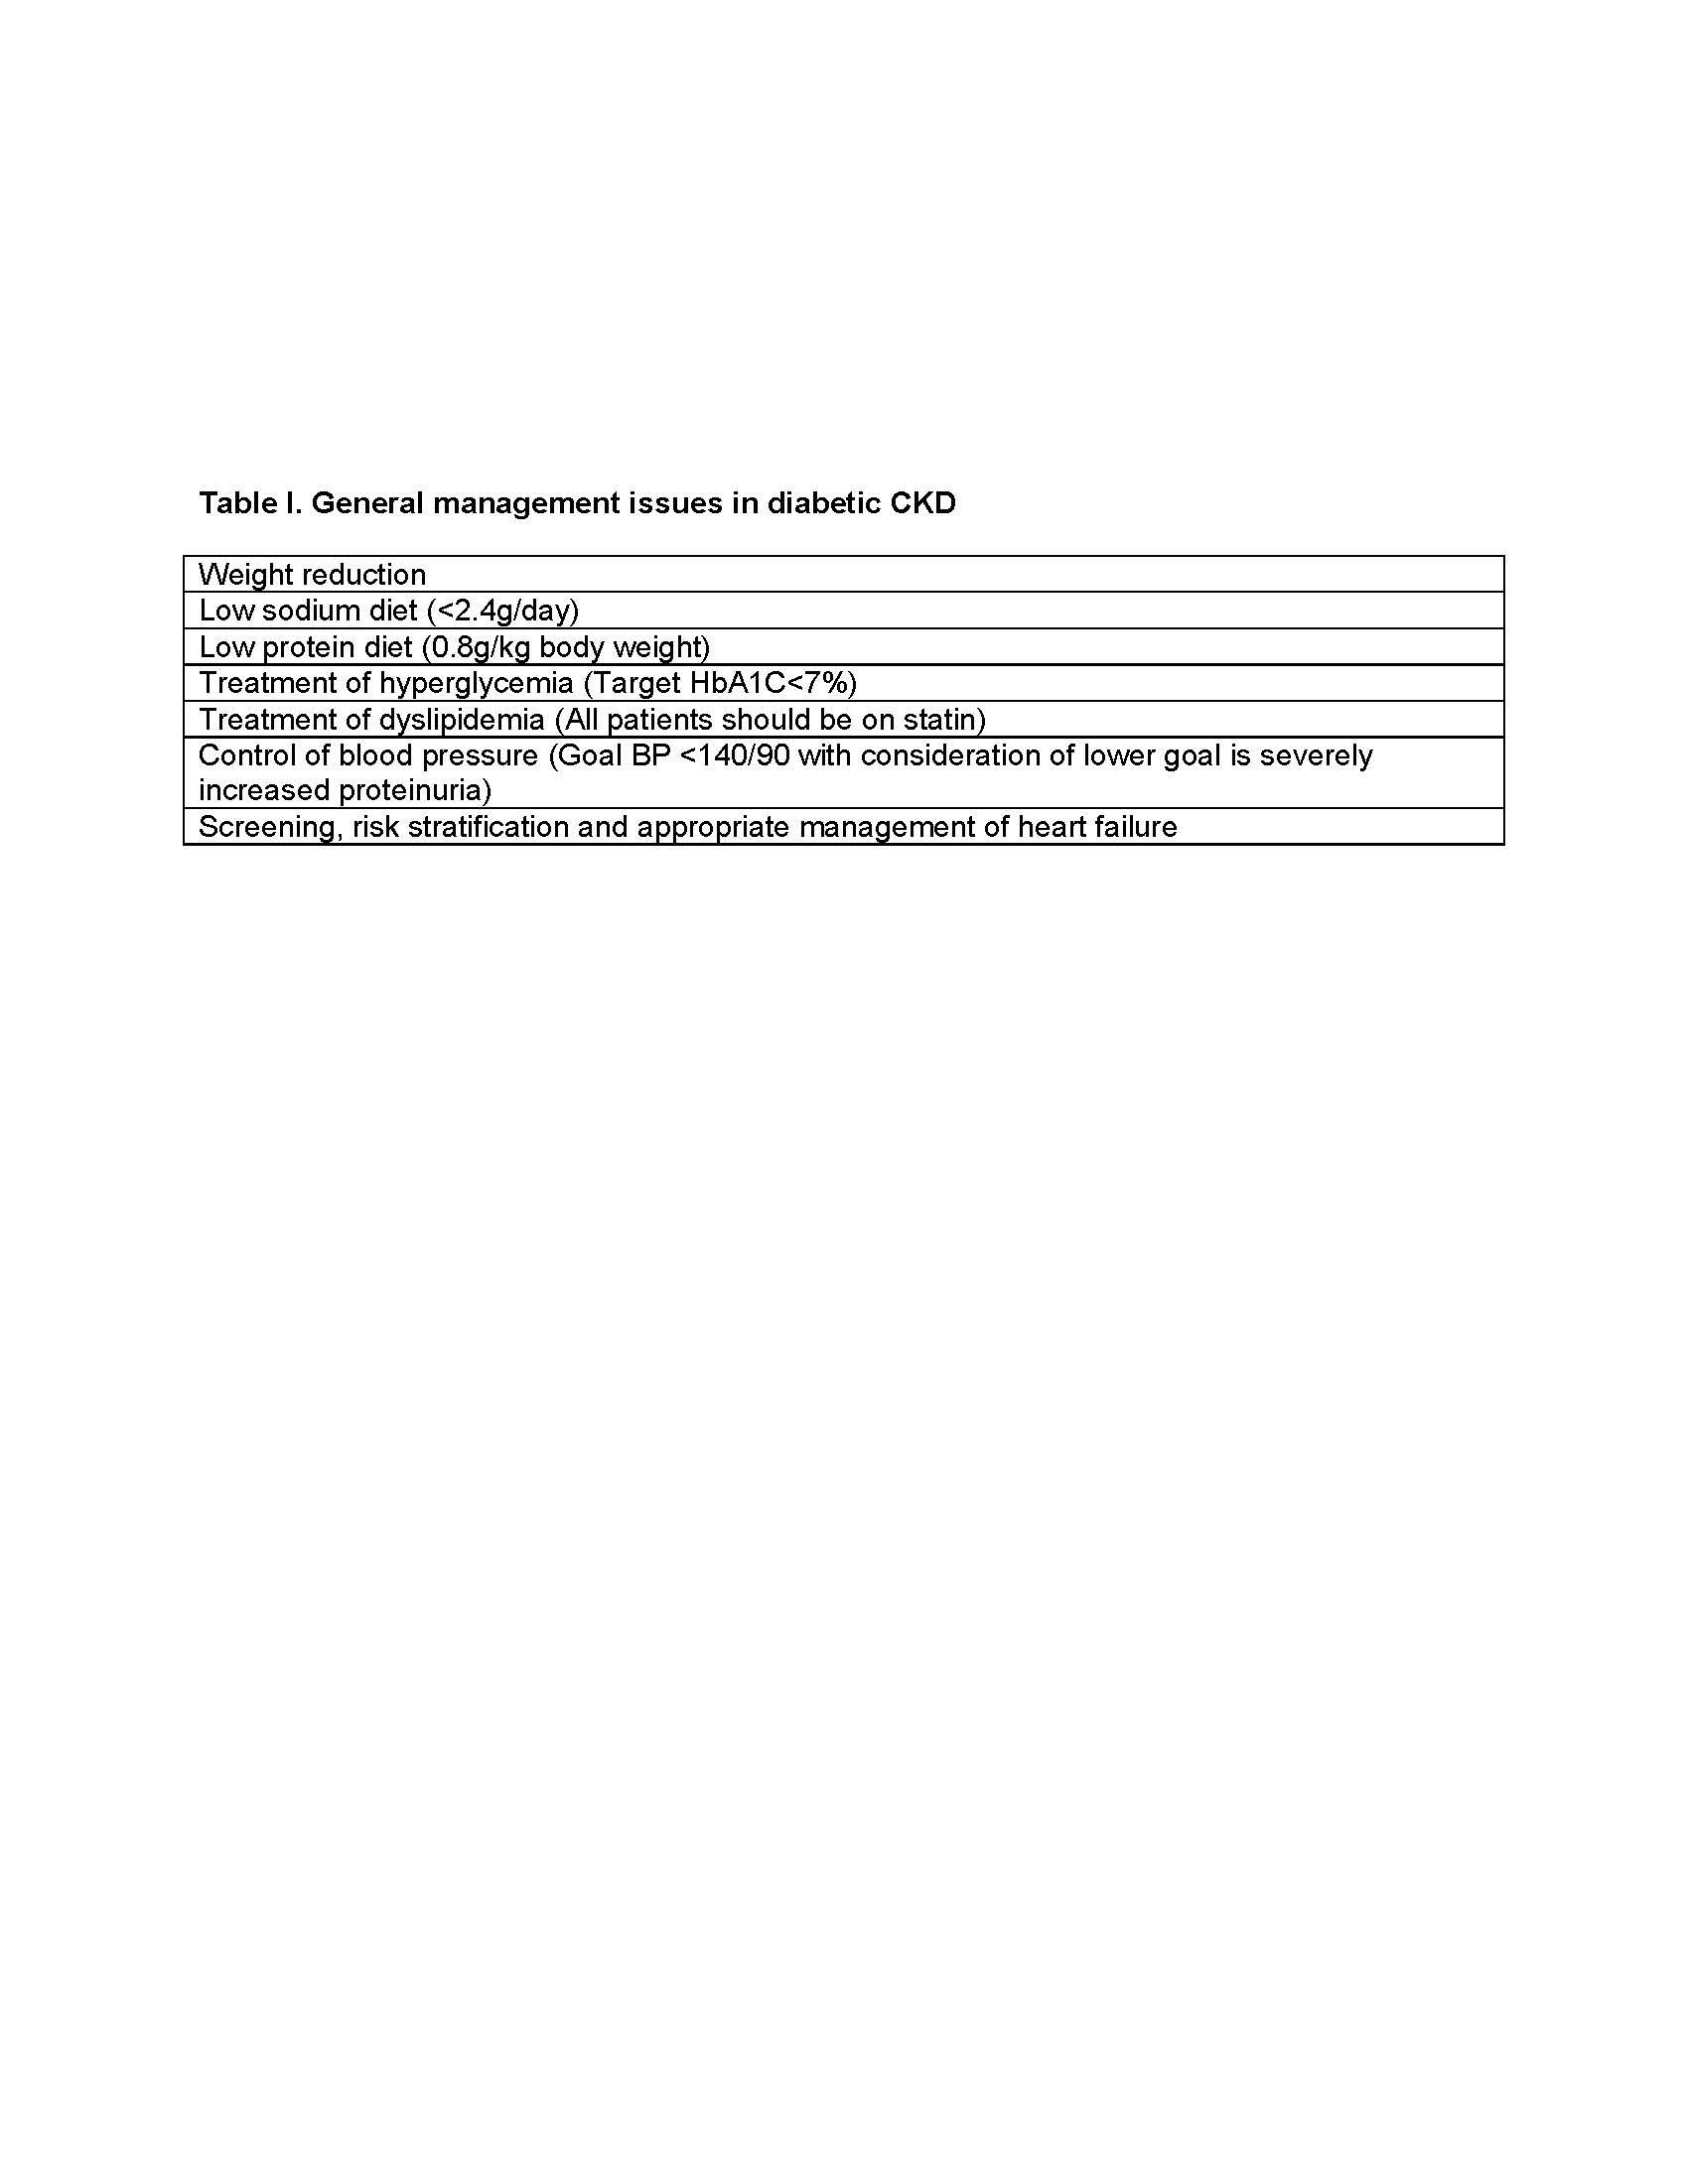 diabetic kidney disease hypertension management renal and general management issues in diabetic ckd